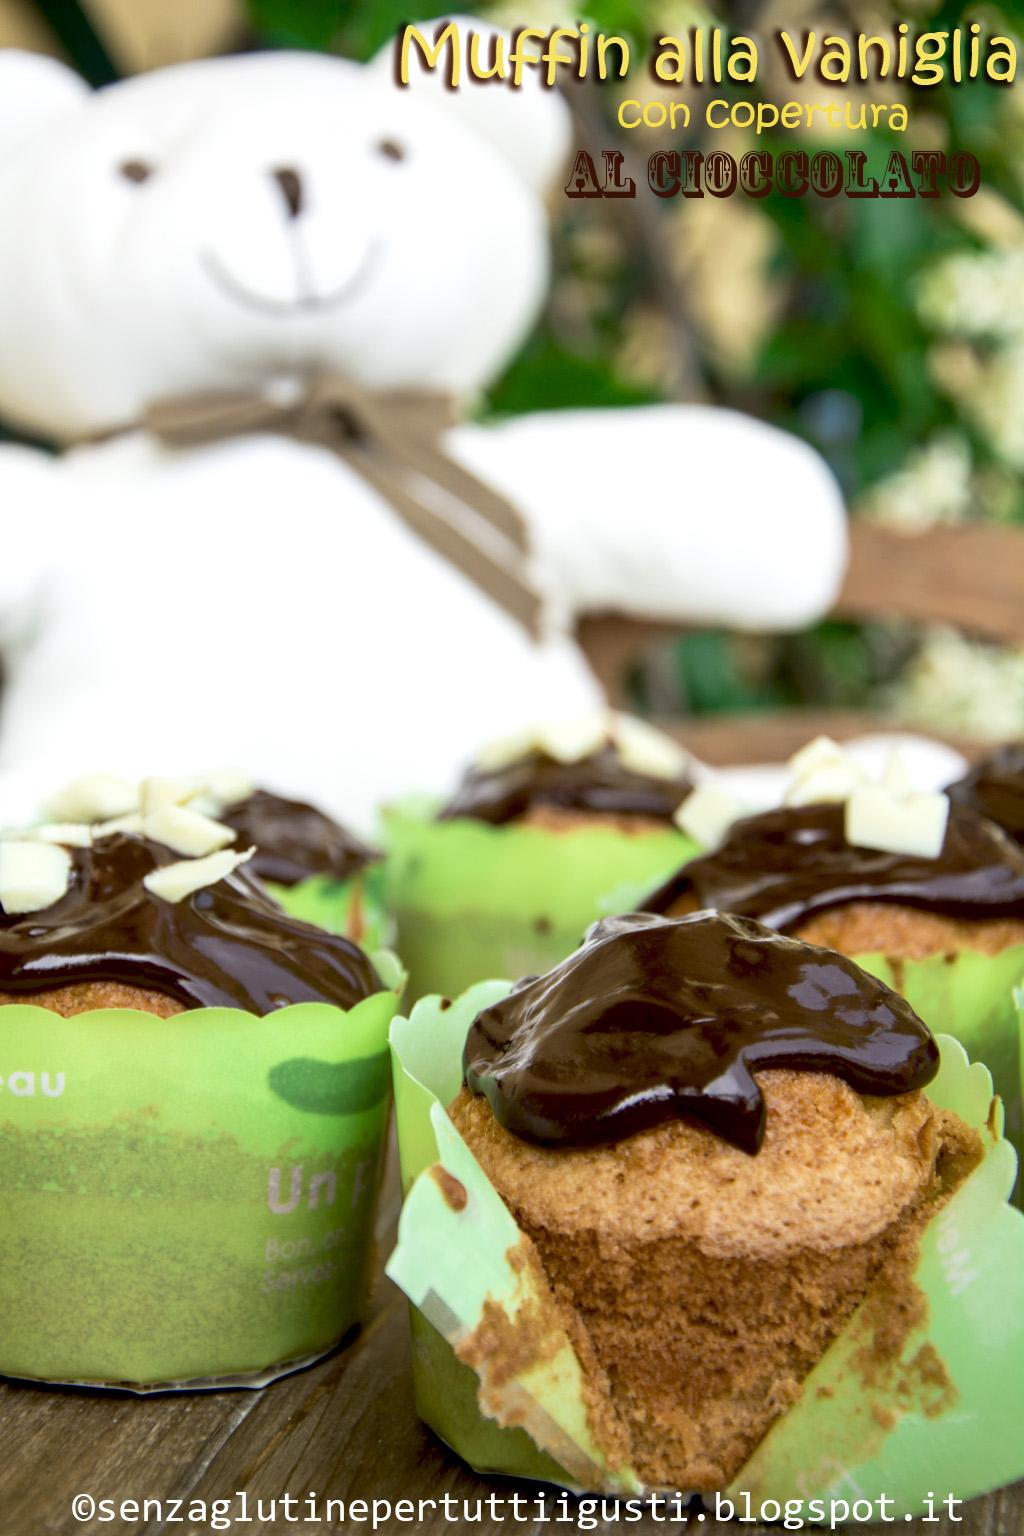 Senza Glutine Per Tutti I Gusti!: Muffin Alla Vaniglia Senza Glutine  #362F10 1024 1536 Cucina Mediterranea Senza Glutine Pdf